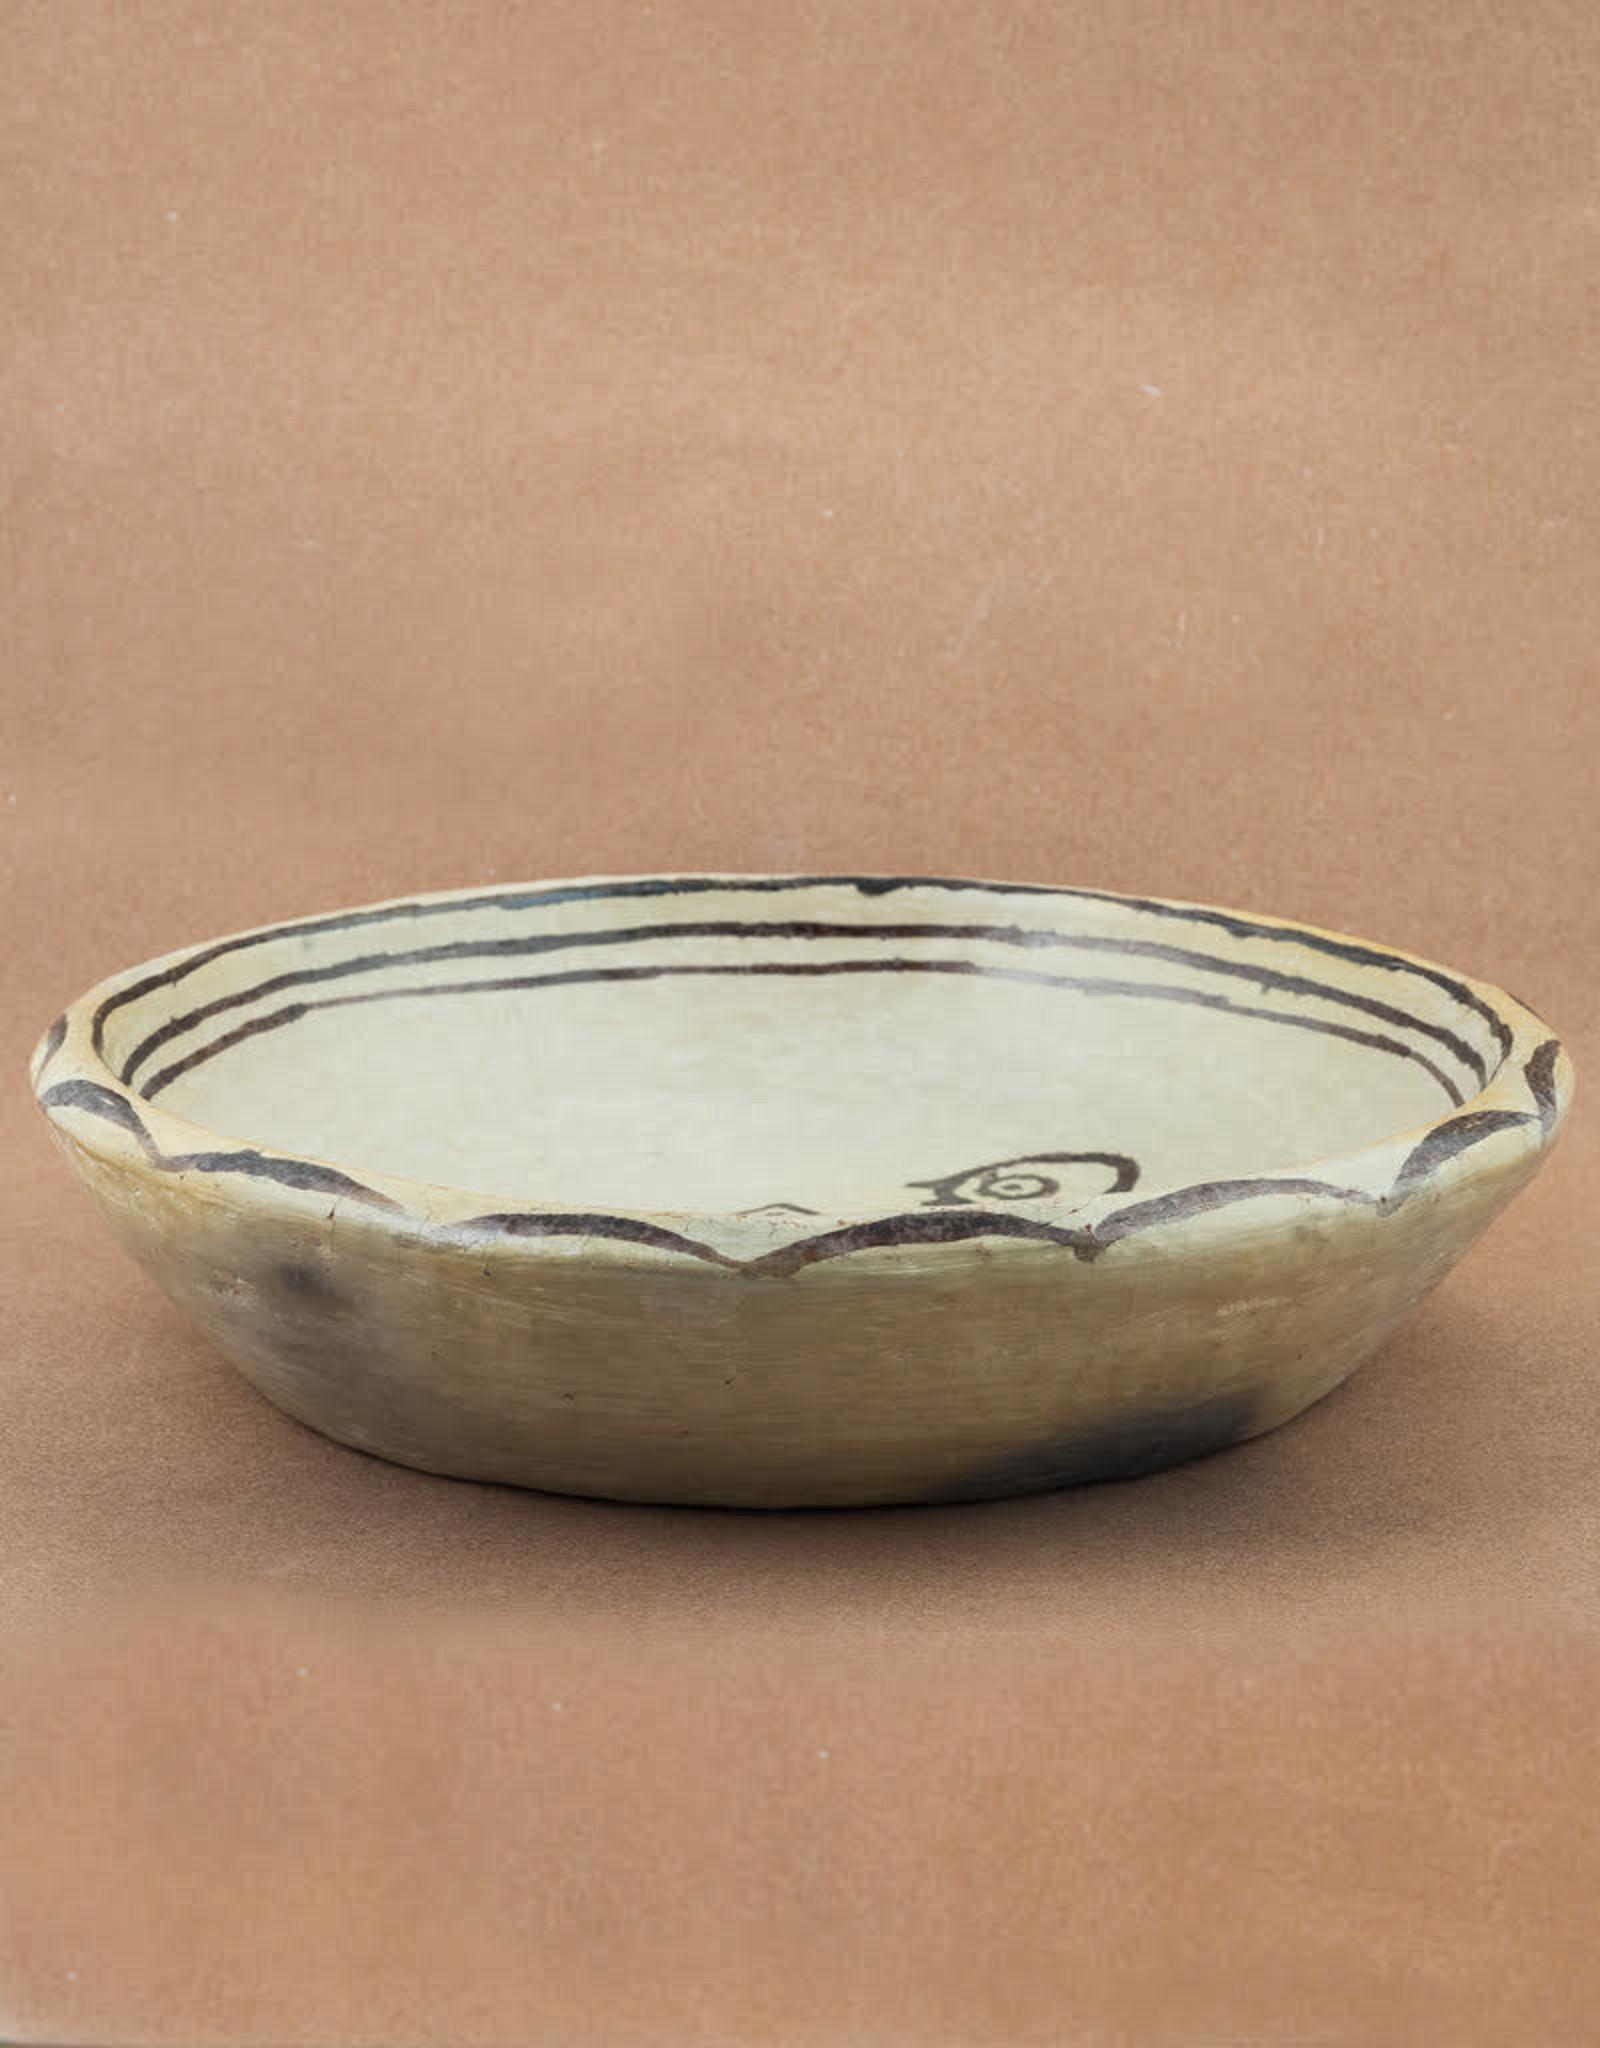 Sejnene Bowl with Camel